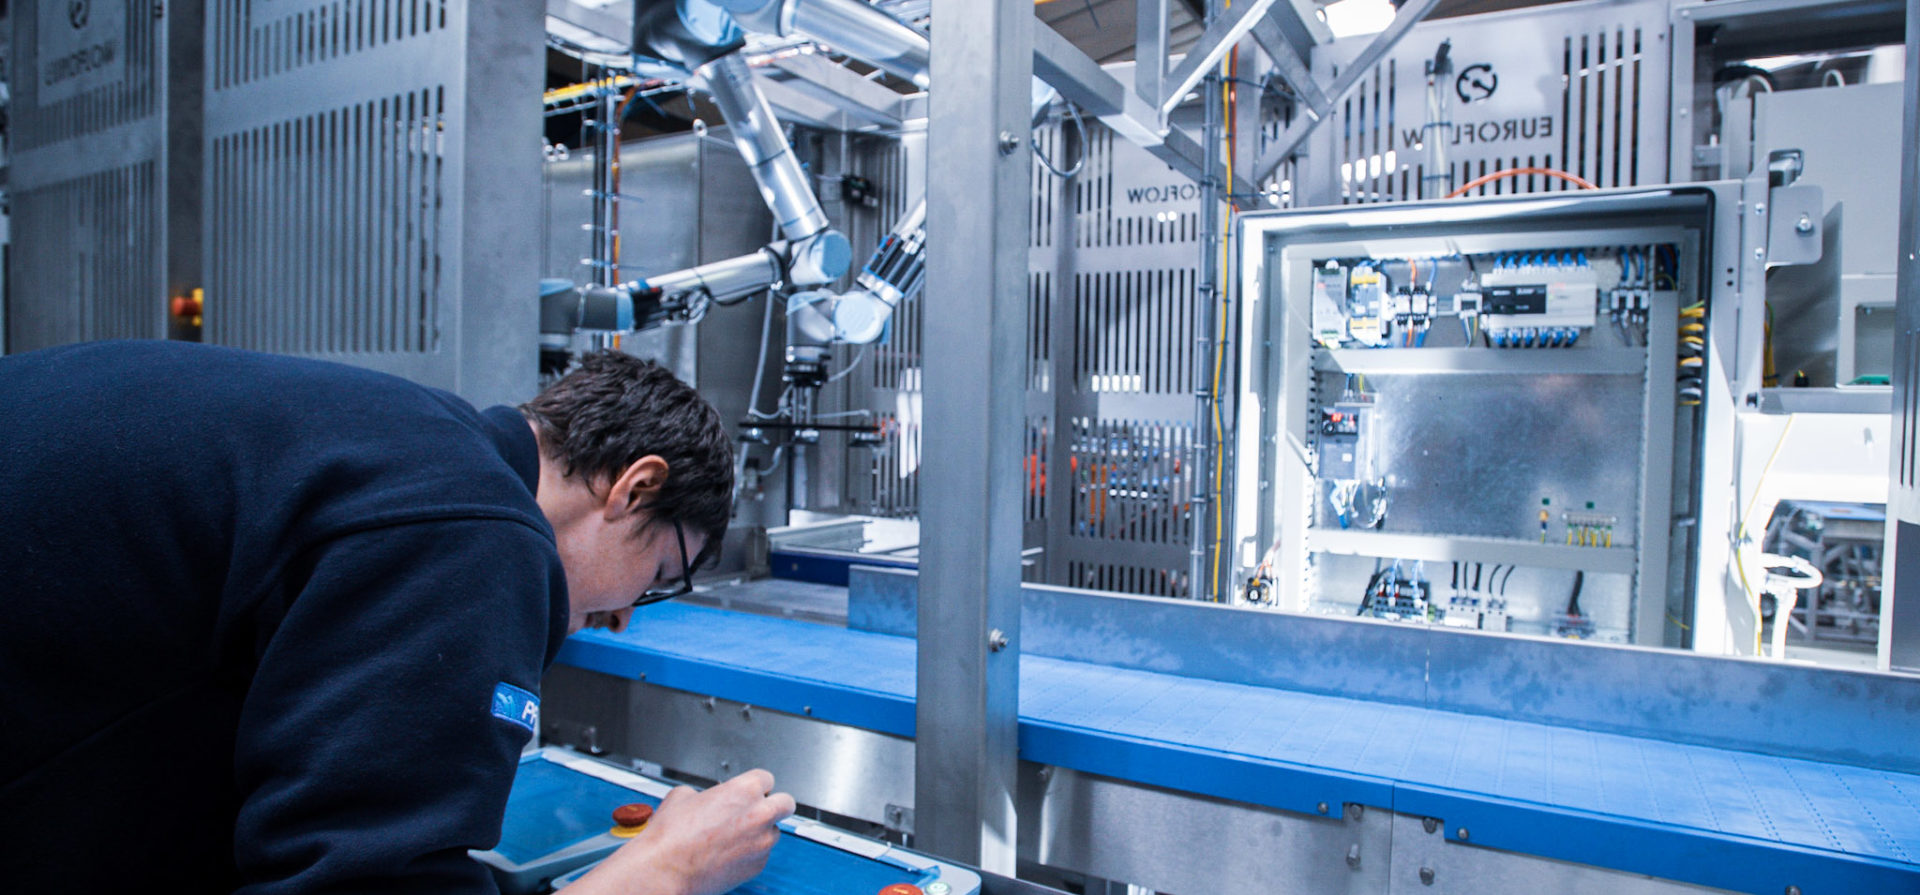 Robotics & Automation - Custom Design | Euroflow Automation Ltd